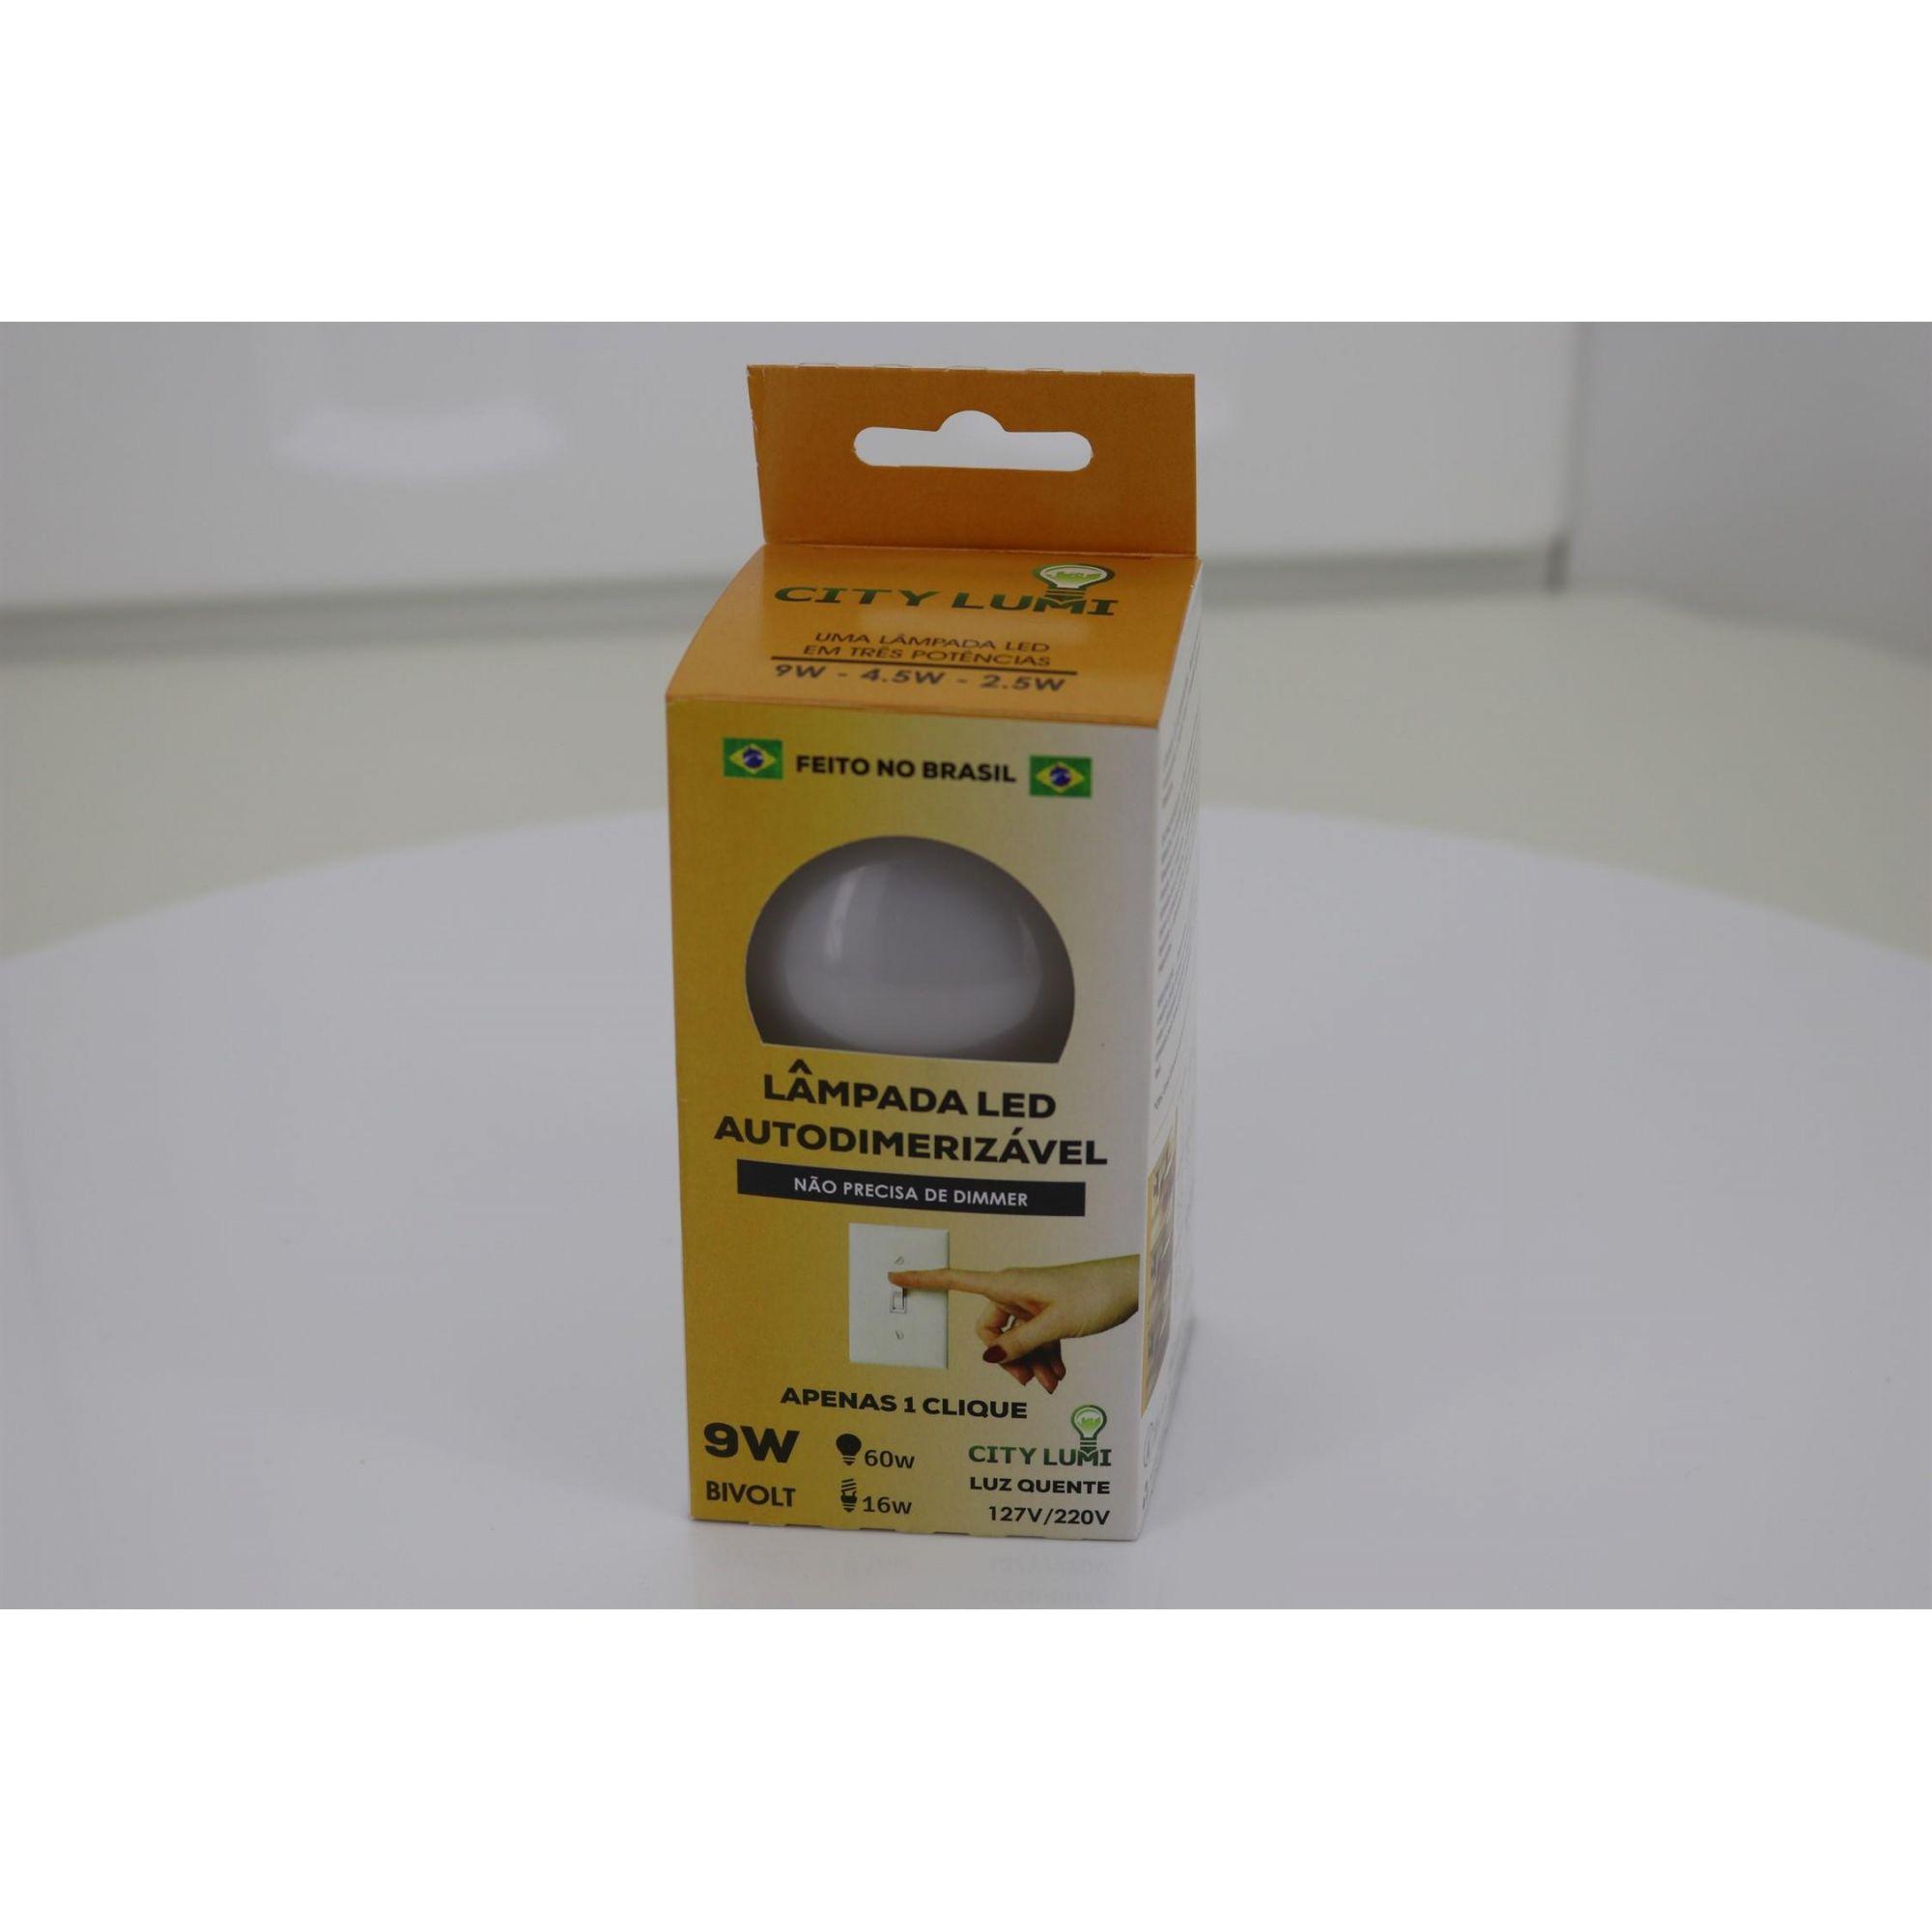 50 Lâmpadas Led Bulbo Autodimerizável 9W - Luz branca quente 3500K